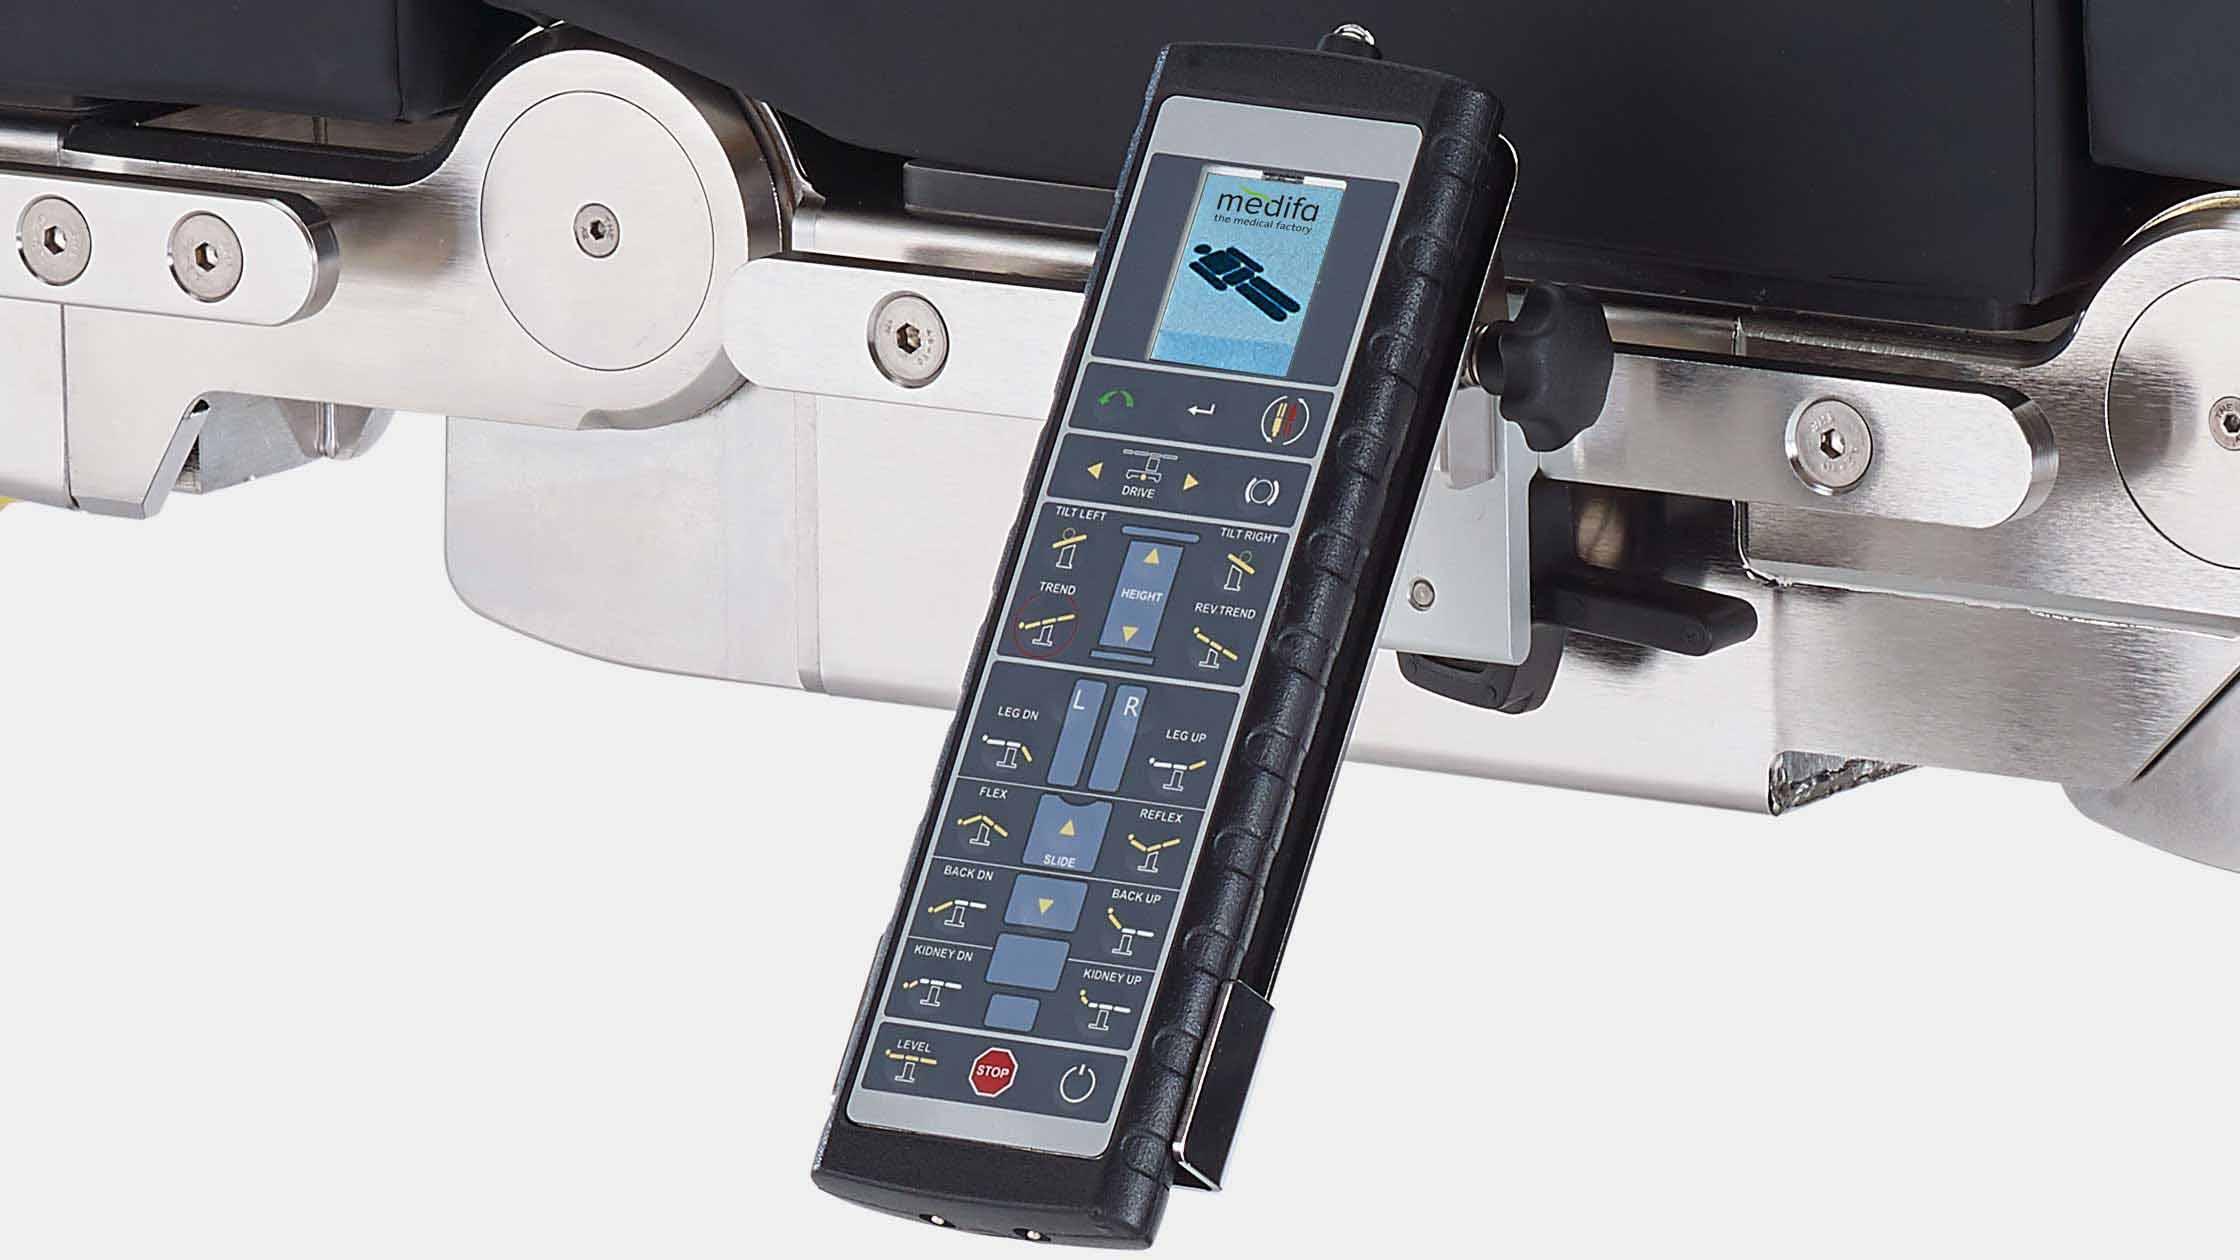 Infrared remote control for medifa 7000